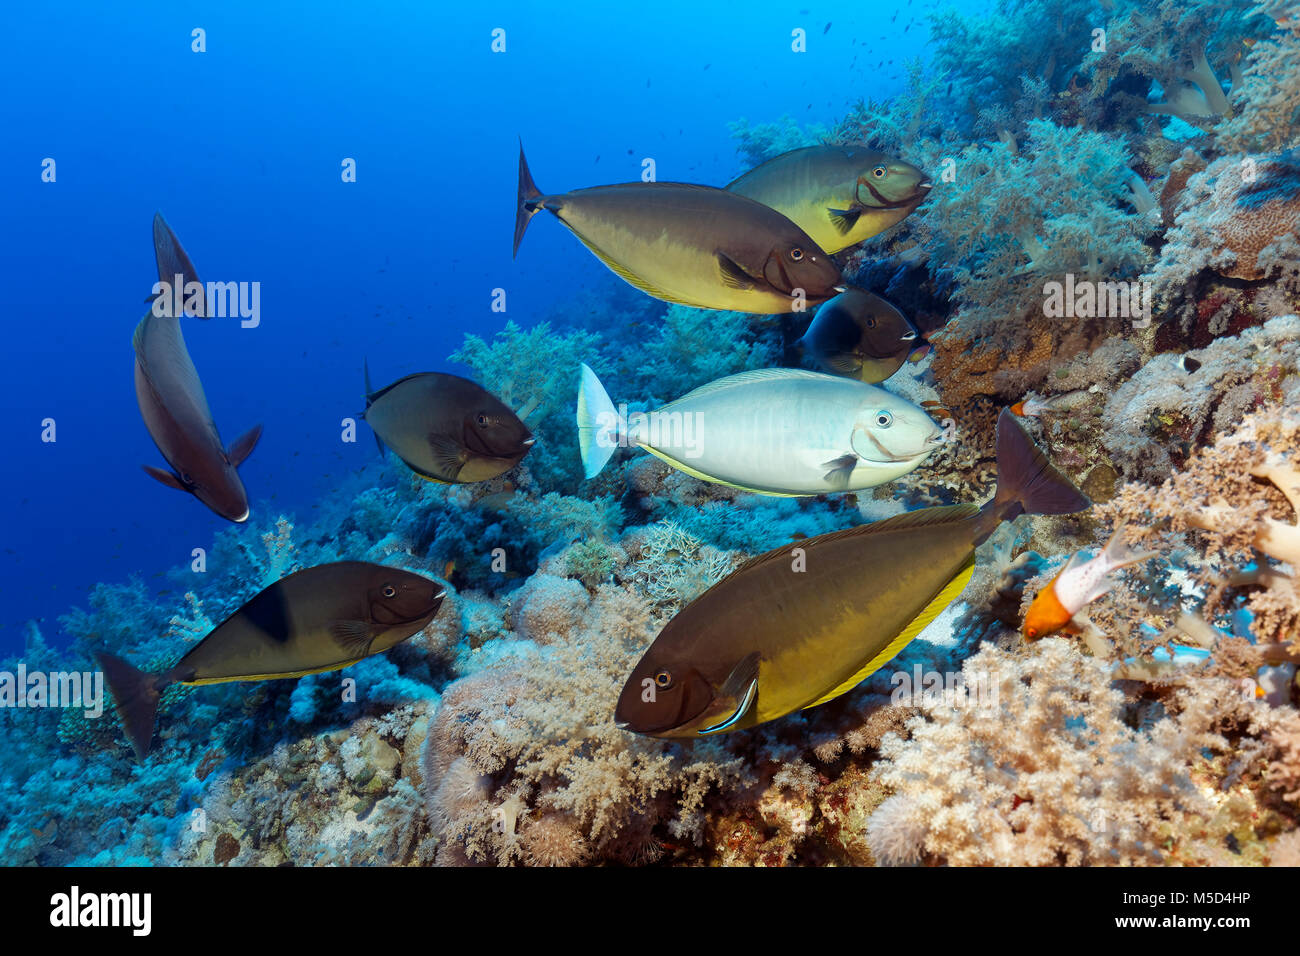 Fish swarm, Bluetail Unicornfish (Naso hexacanthus), various colours, at cleaning station, Bluestreak cleaner wrasse - Stock Image